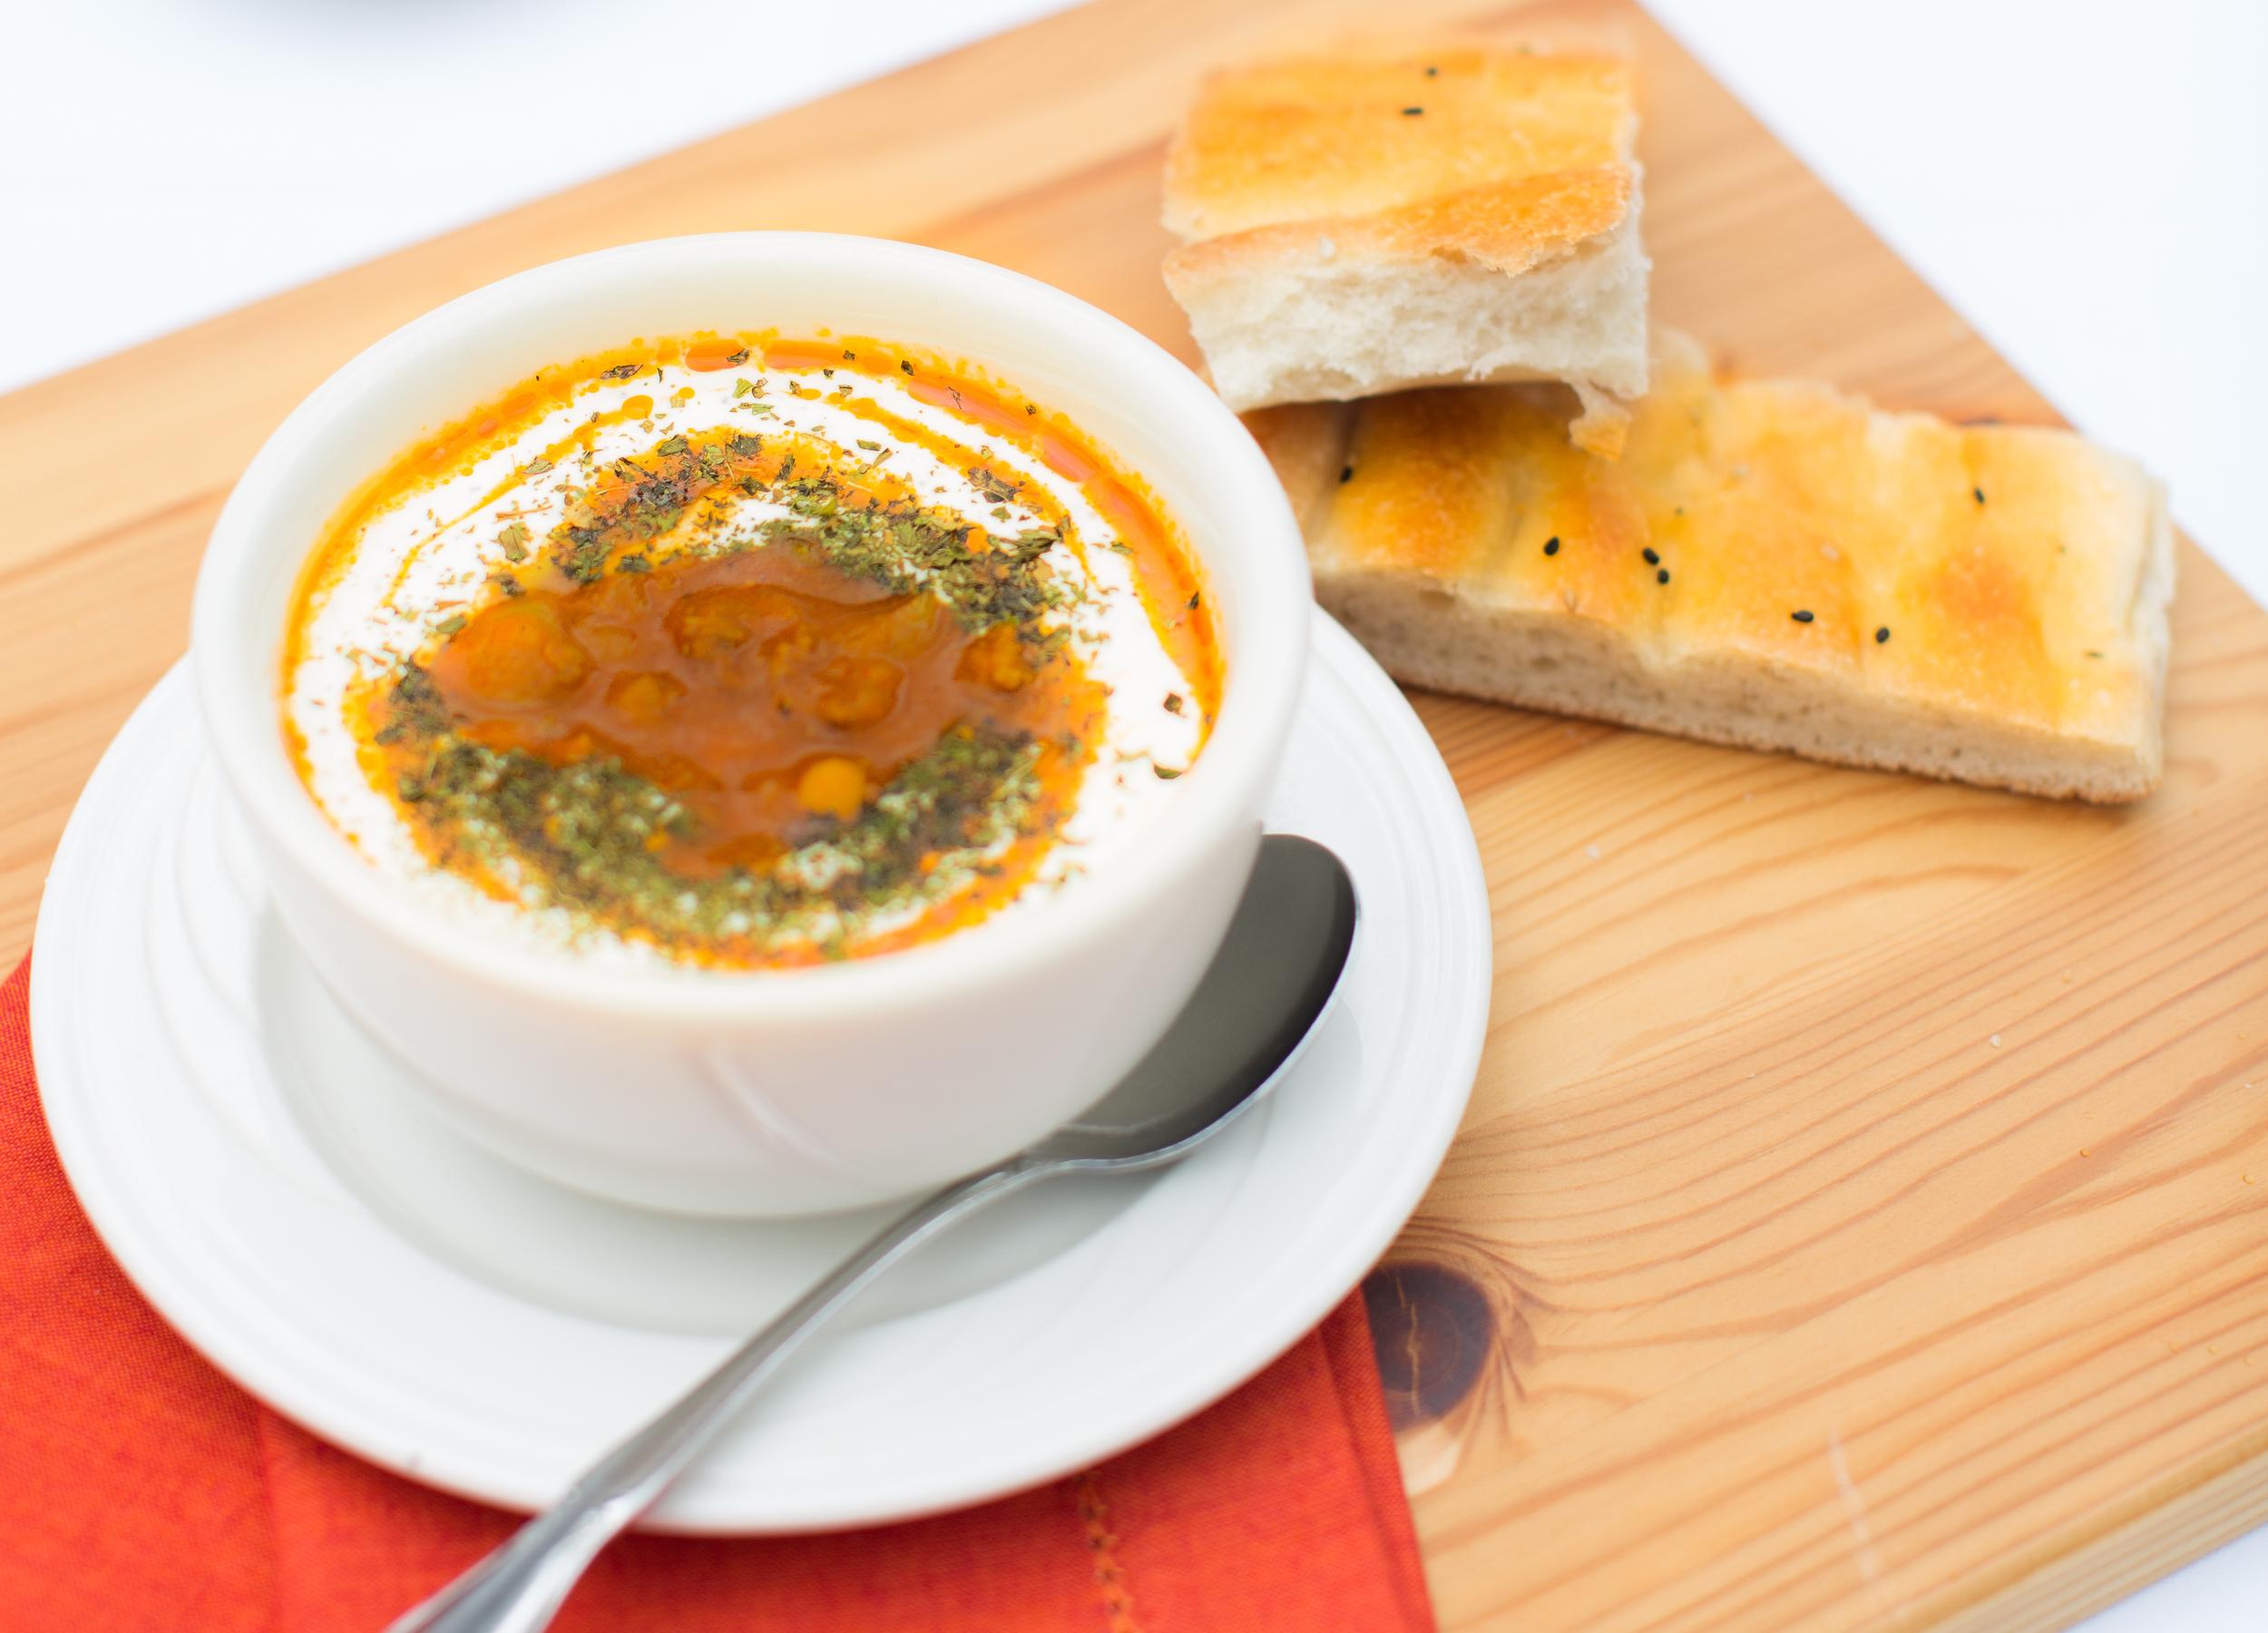 Panjshir-Cam-2-horizontal-7-nabu-food-photography.jpg